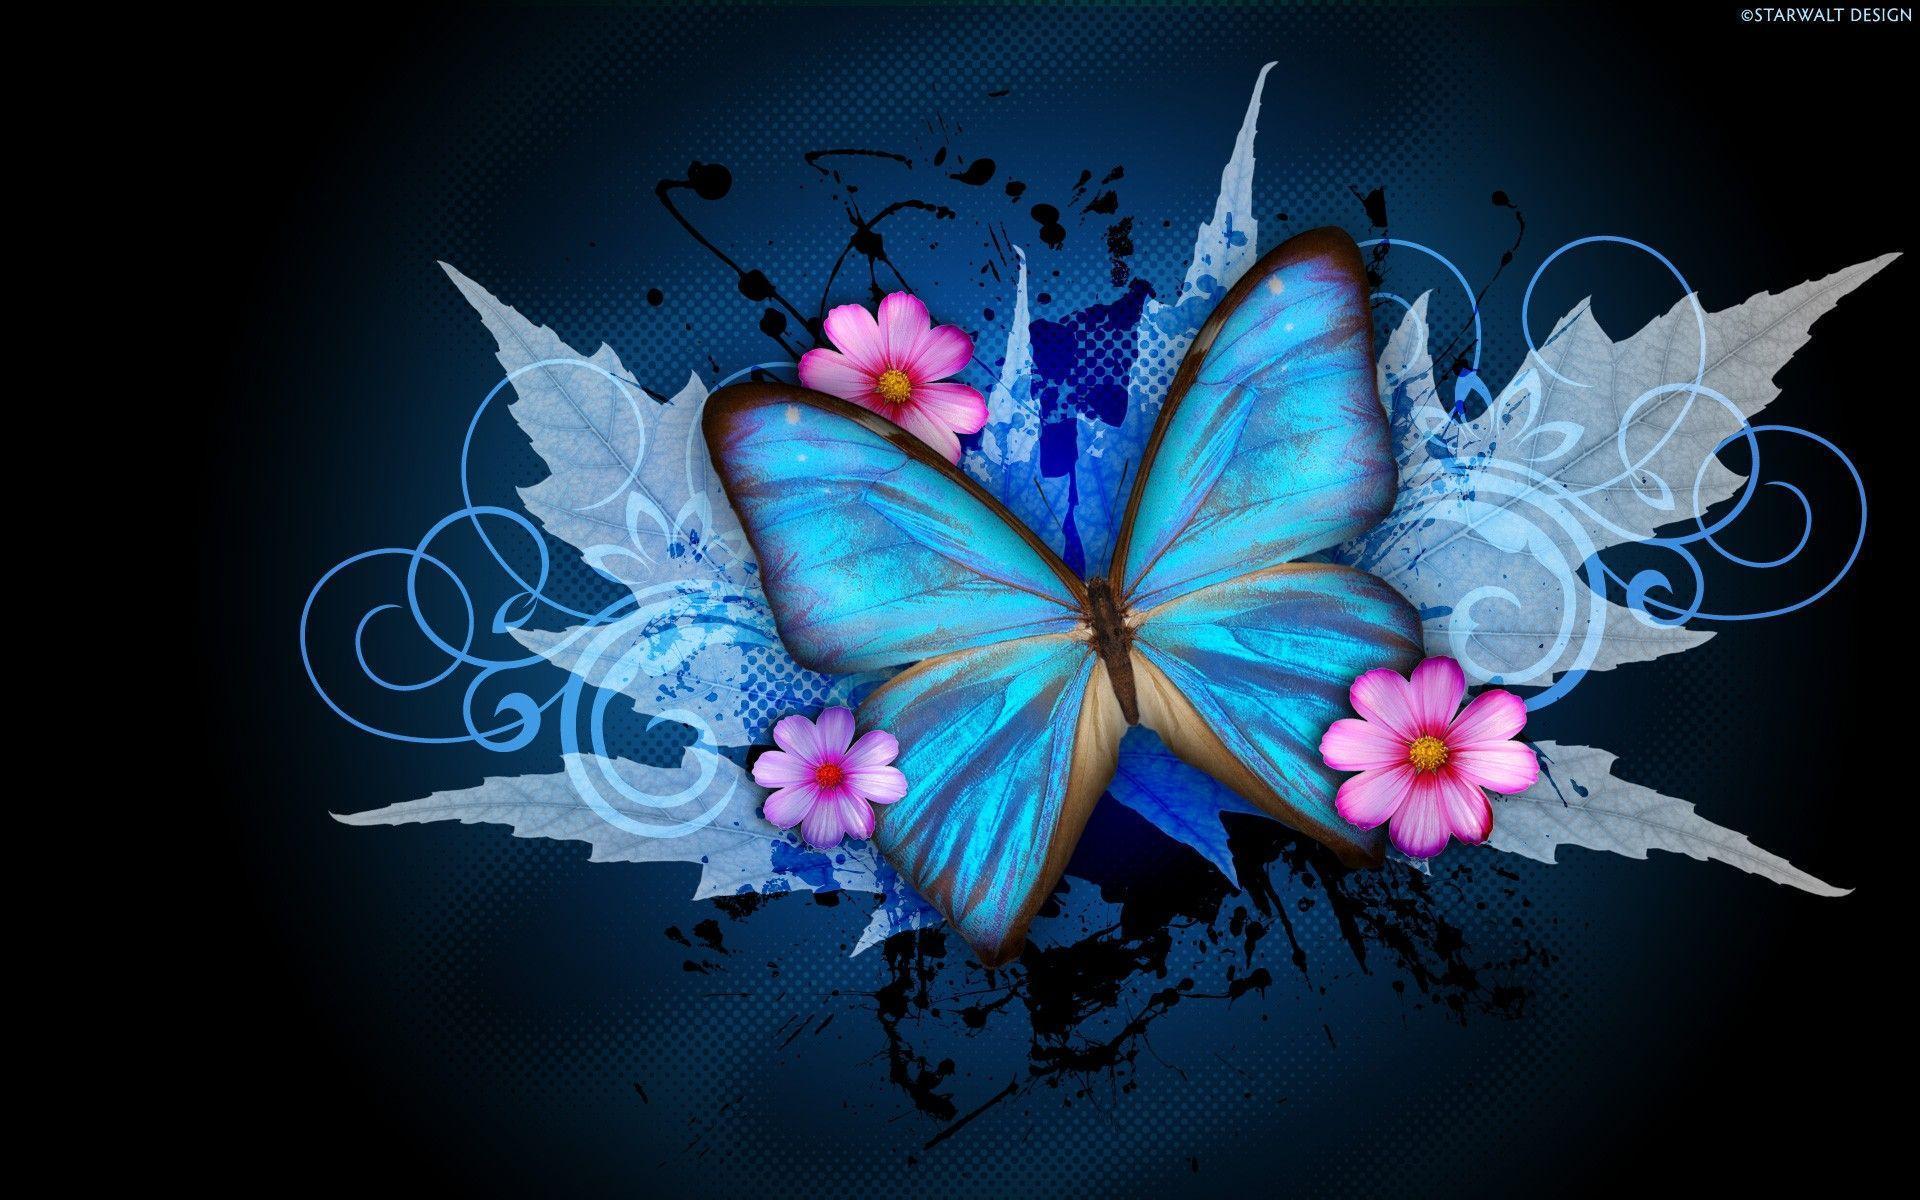 Butterfly Wallpaper for Desktop - WallpaperSafari